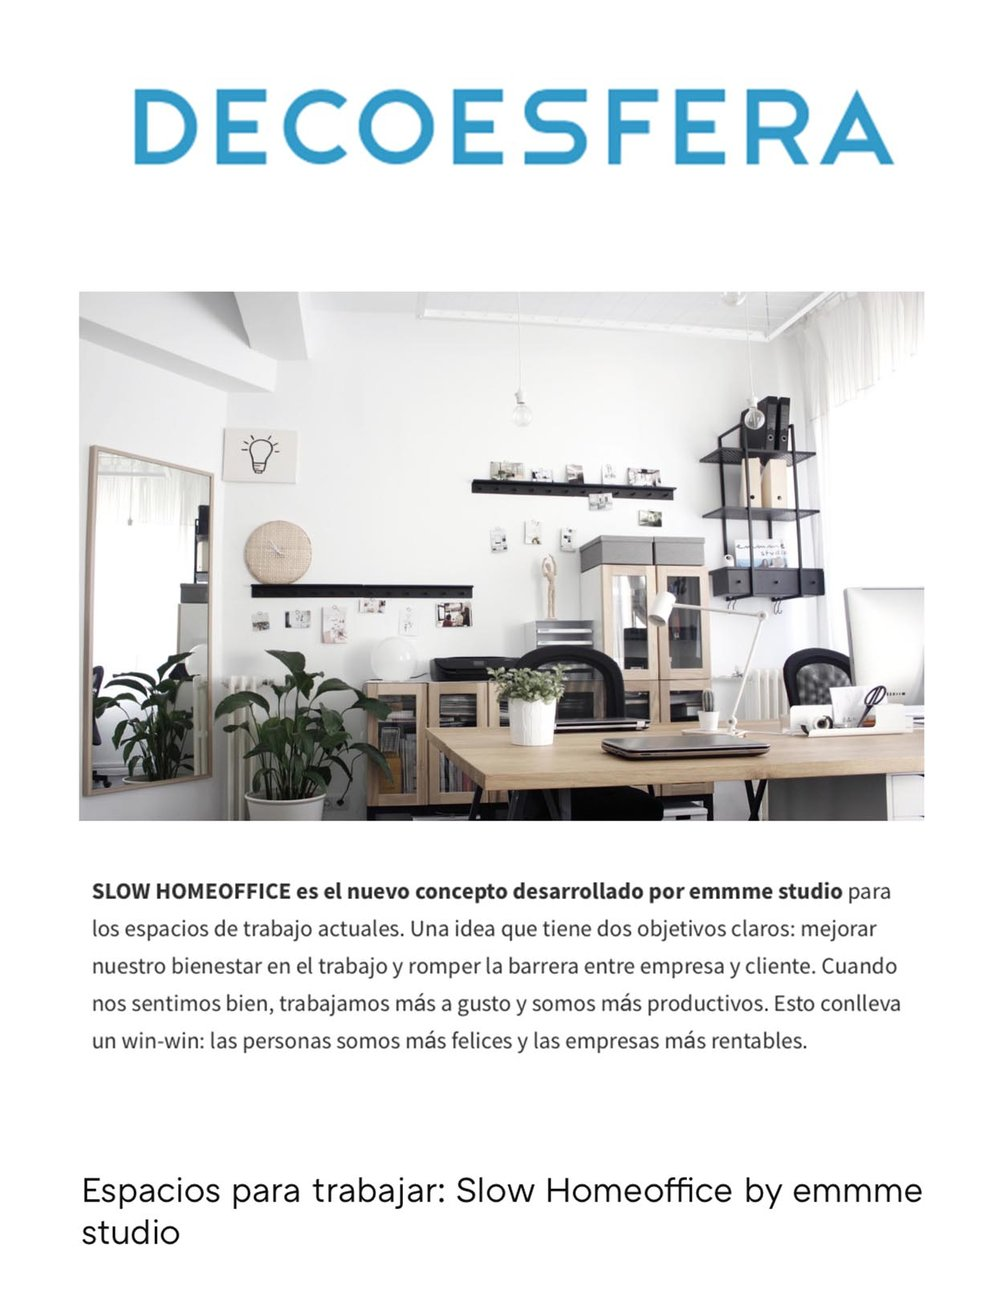 emmme studio decoesfera reformas diseño slow prensa slowhomeoffice.jpg